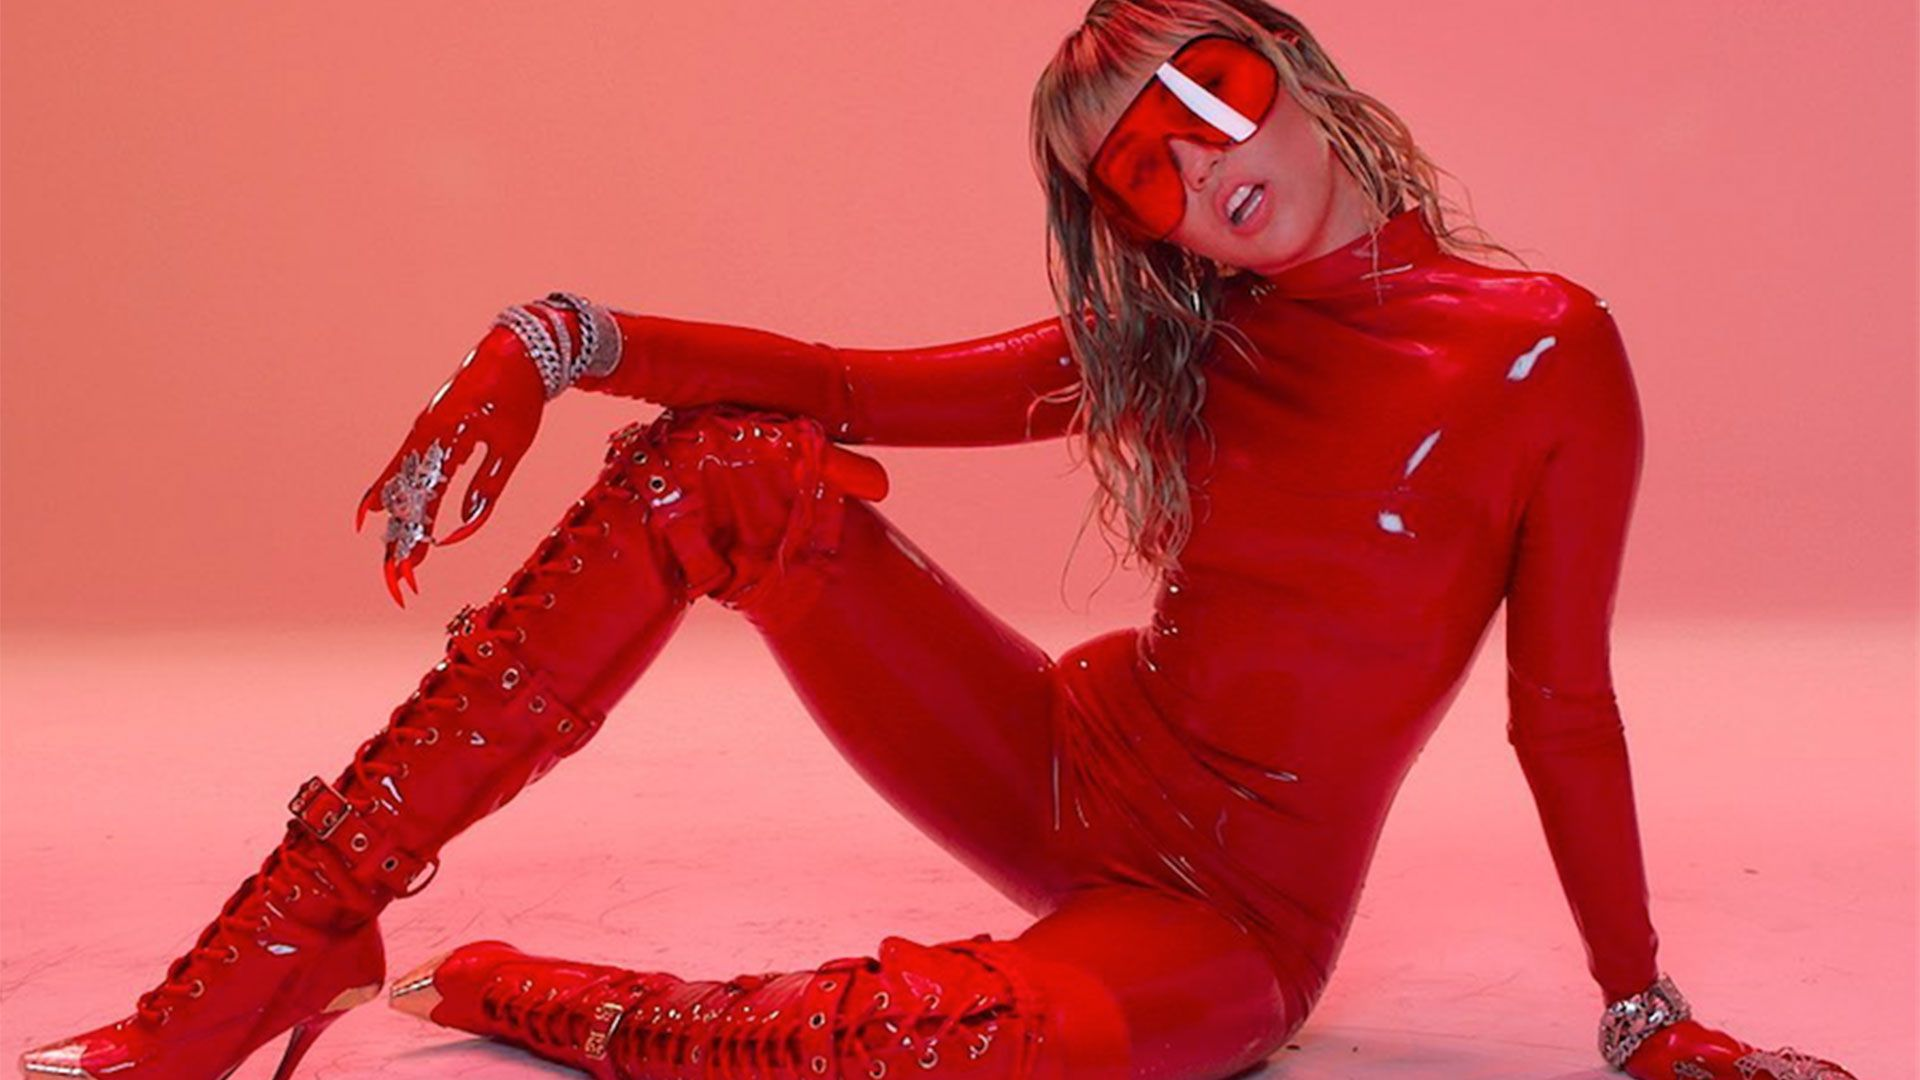 Miley Cyrus declaró en 2015 ser pansexual